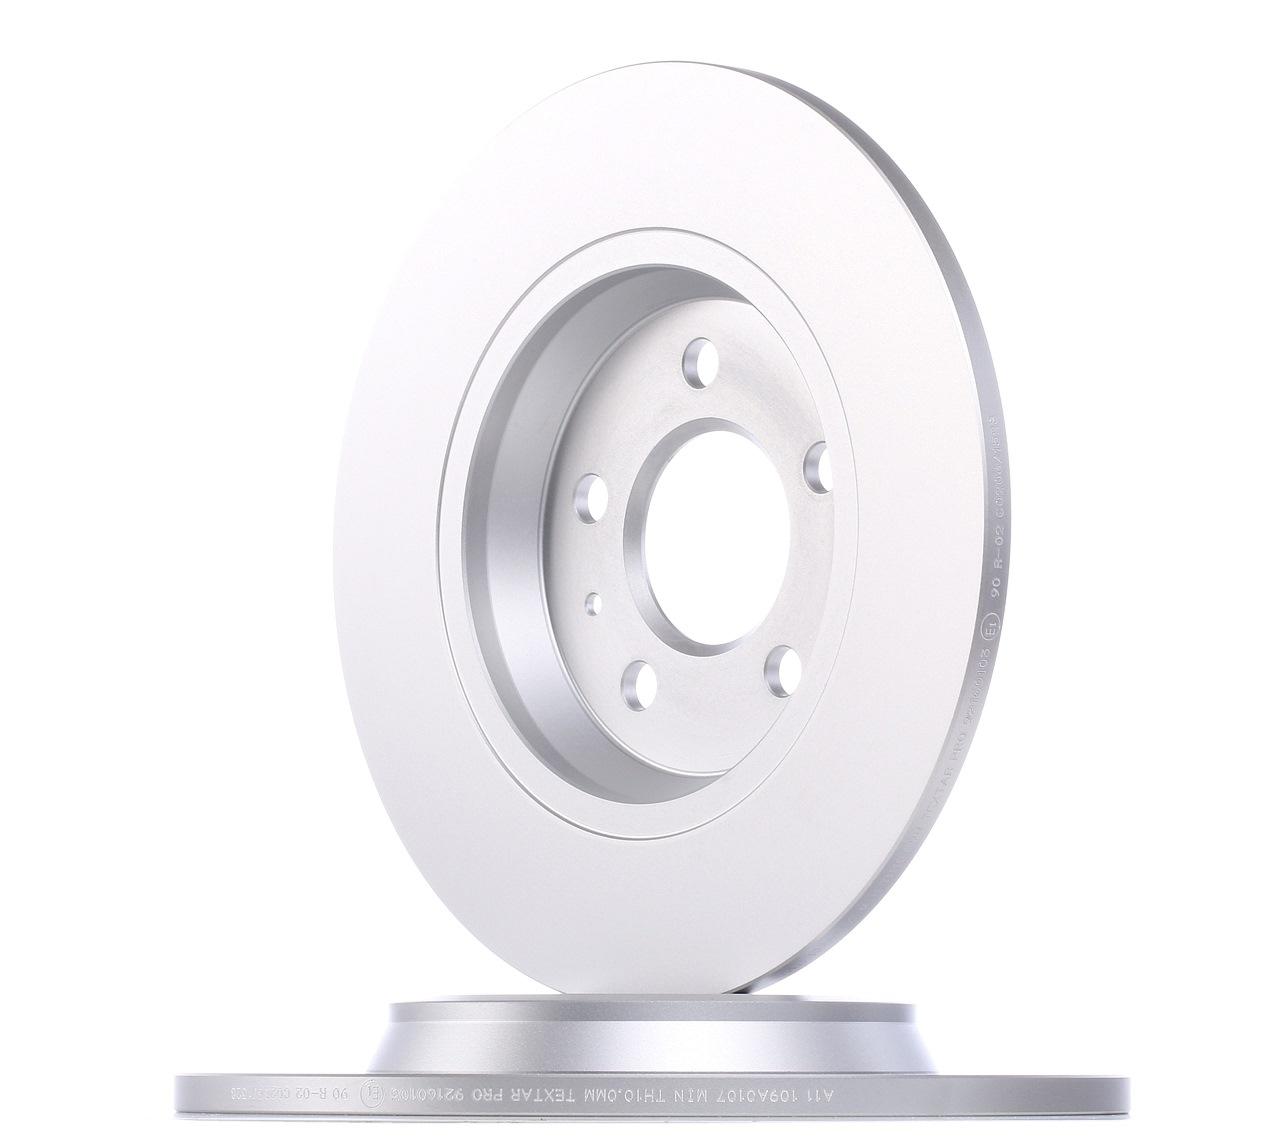 Set dischi freni 92160103 TEXTAR — Solo ricambi nuovi